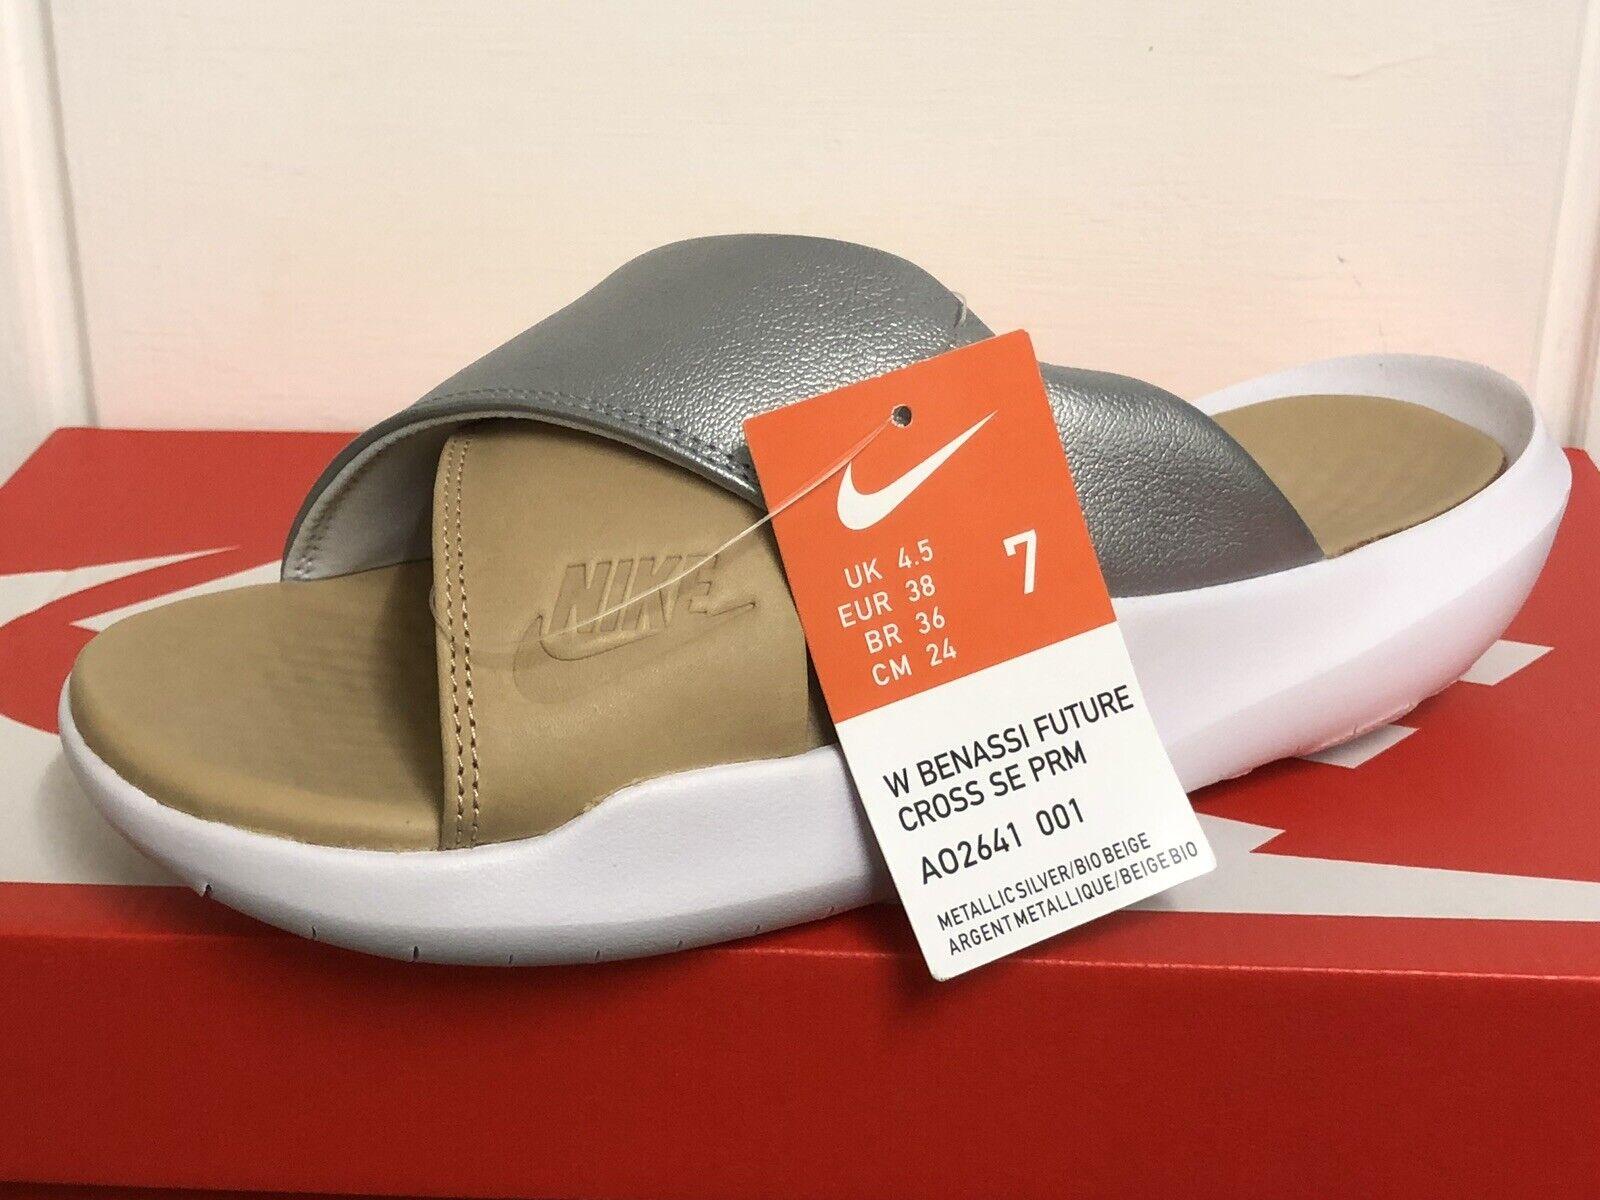 Nike Benassi futuro Cross diapositive INFRADITO DA DONNA TG EUR 38 US 7